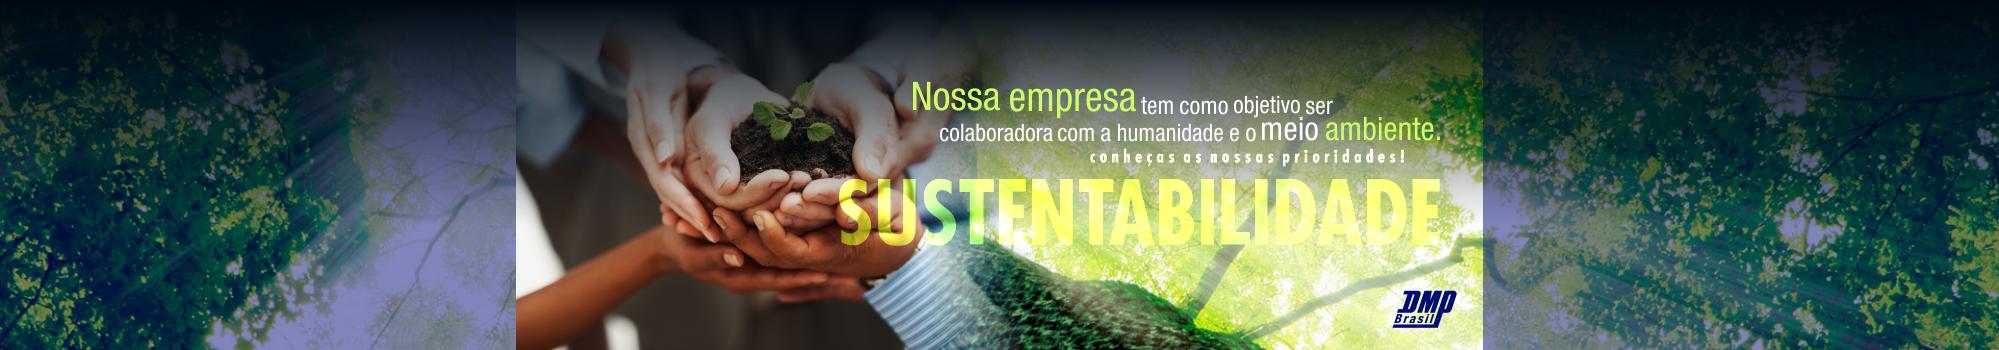 banners-site-DMP-sustentabilidade1